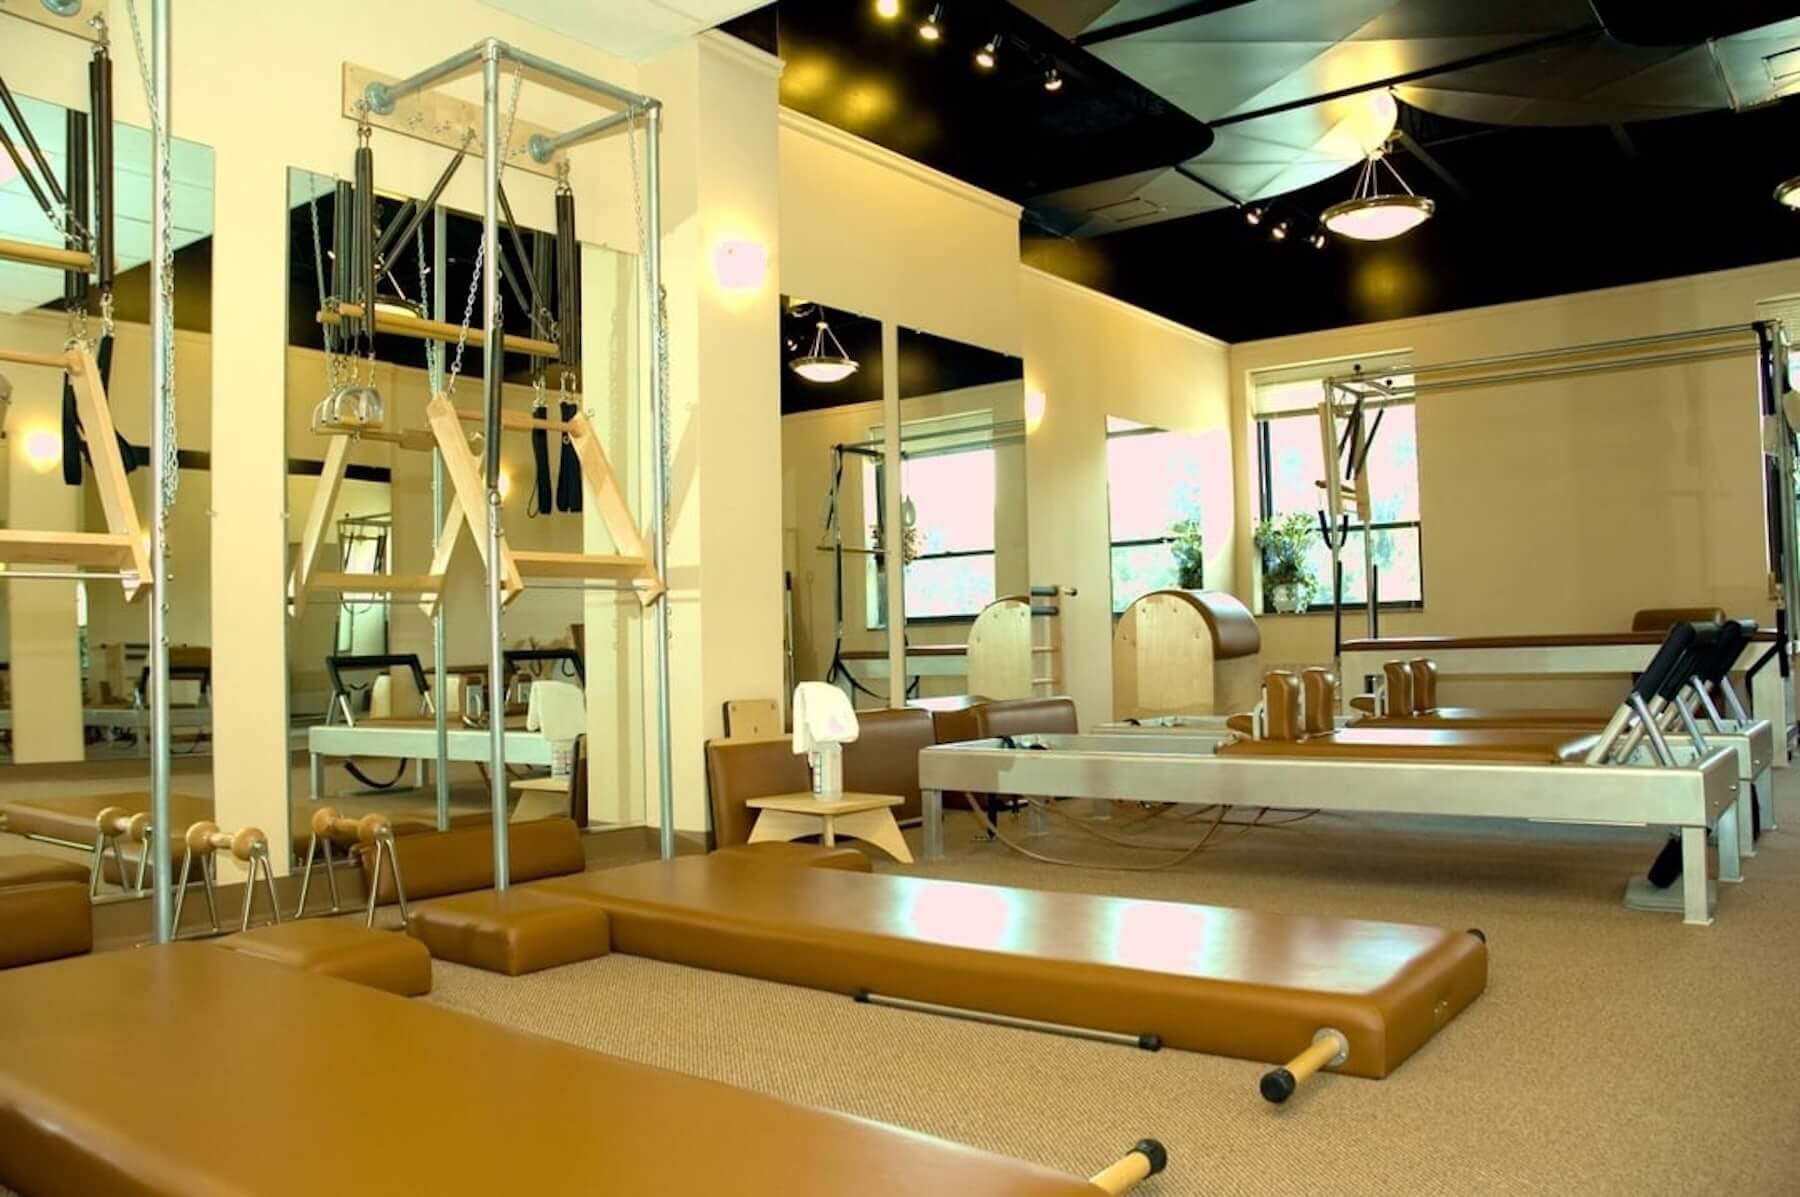 pilates apparatuses